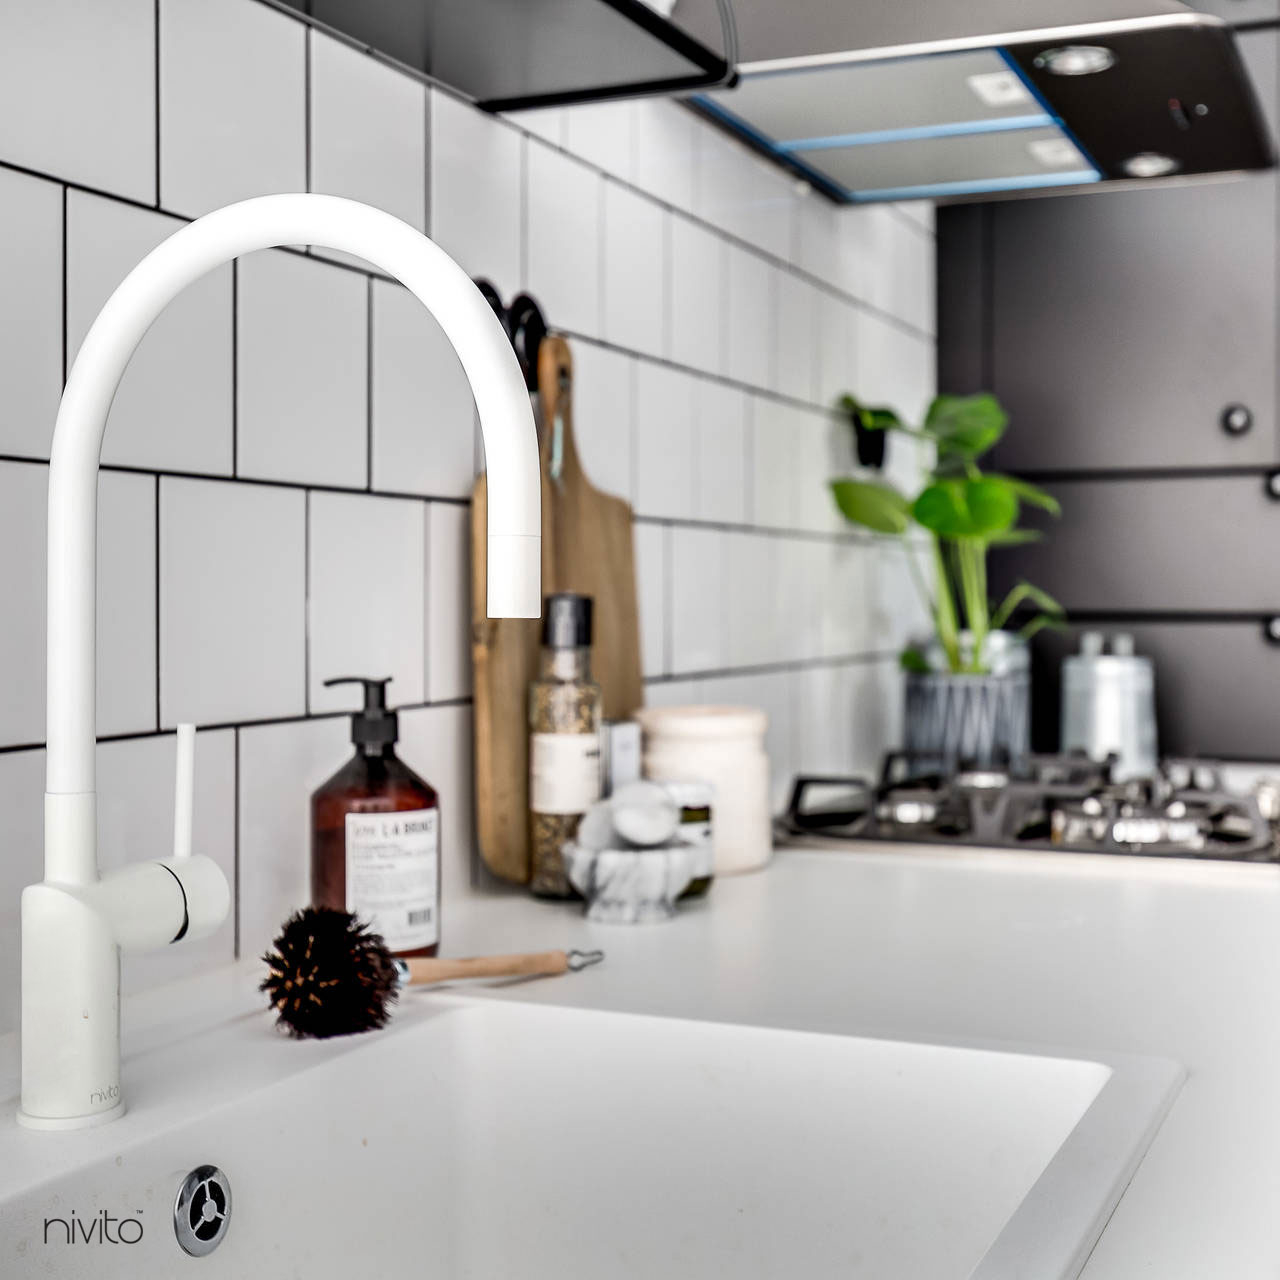 White faucet